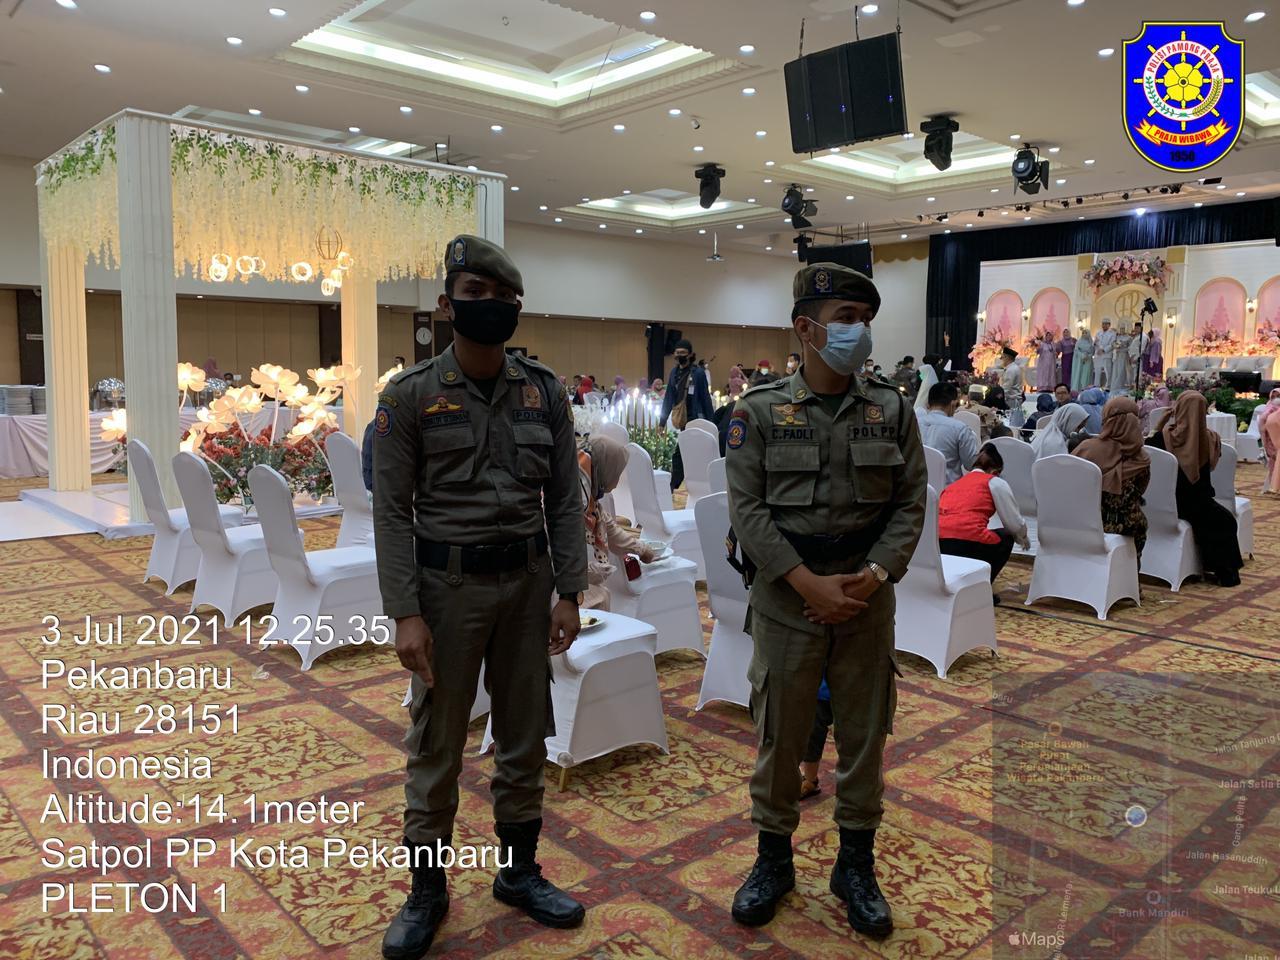 Satpol PP Cek Prokes di Sejumlah Lokasi Pernikahan